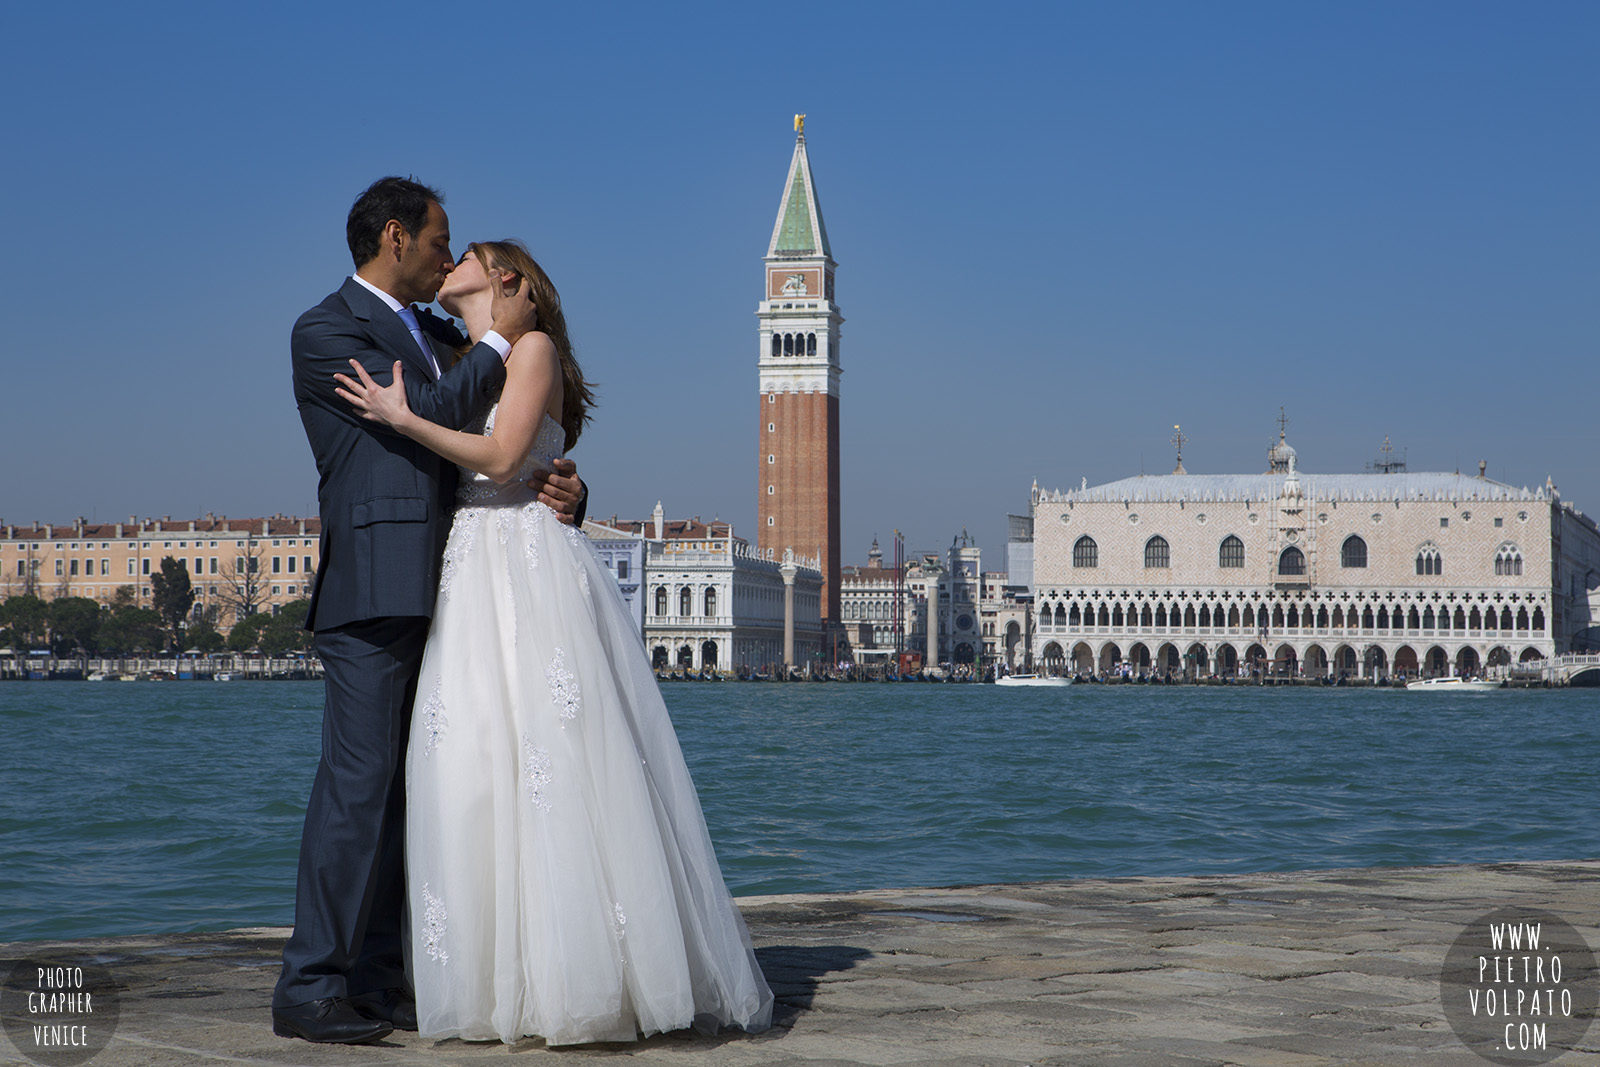 venice-wedding-honeymoon-photographer-20140312_03